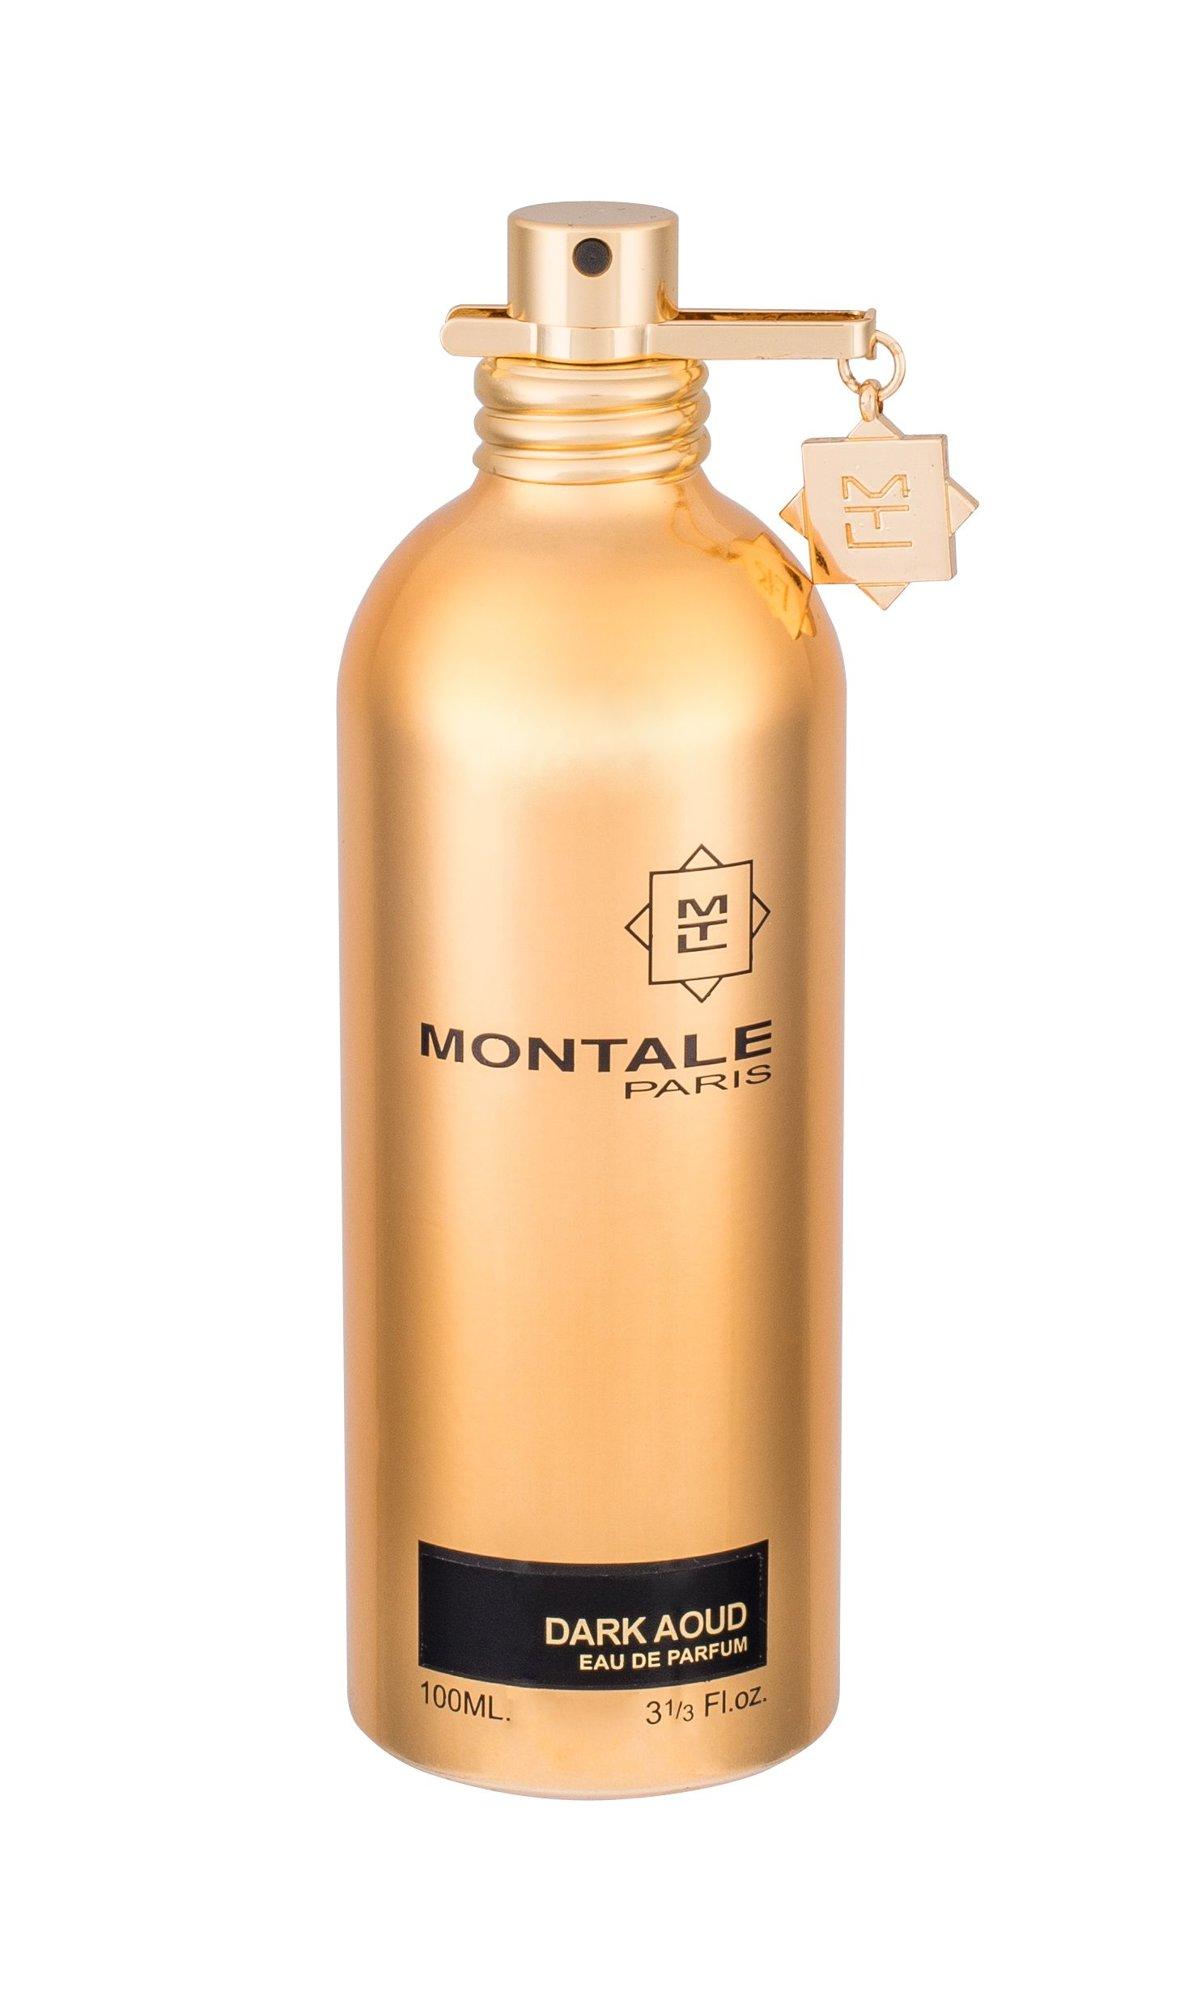 Montale Paris Dark Aoud, edp 100ml